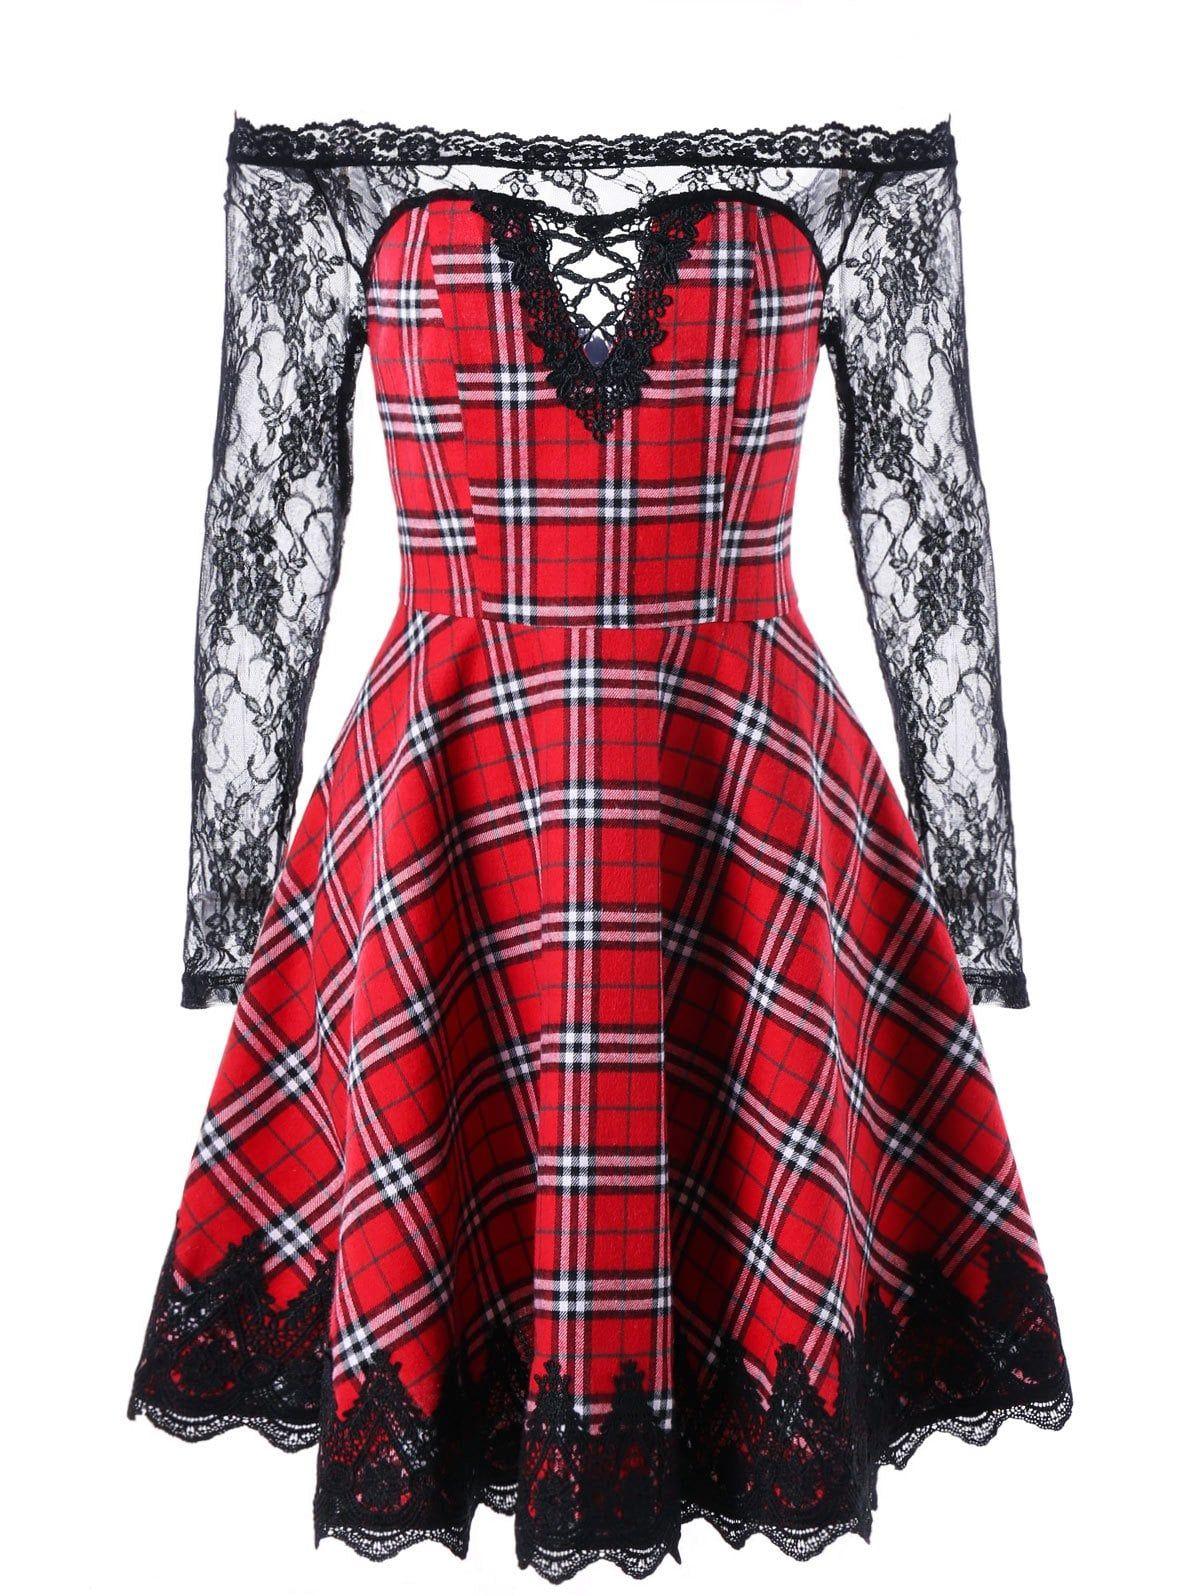 2cc3703706 Sheer Plaid Off The Shoulder Dress - RED BLACK XL